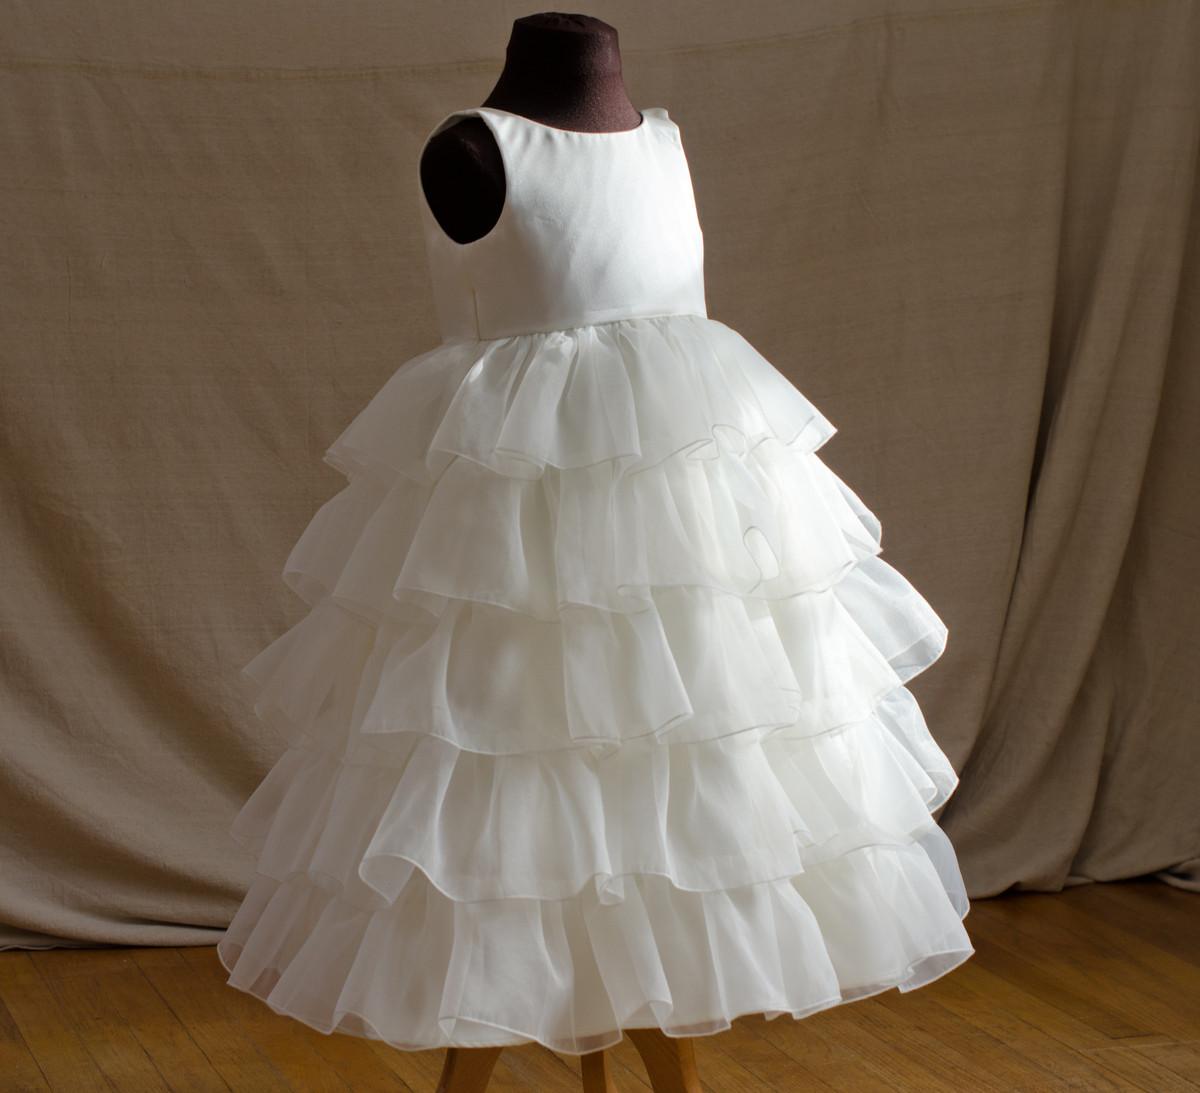 flower girl closet dress rentals dress attire troy ny weddingwire. Black Bedroom Furniture Sets. Home Design Ideas